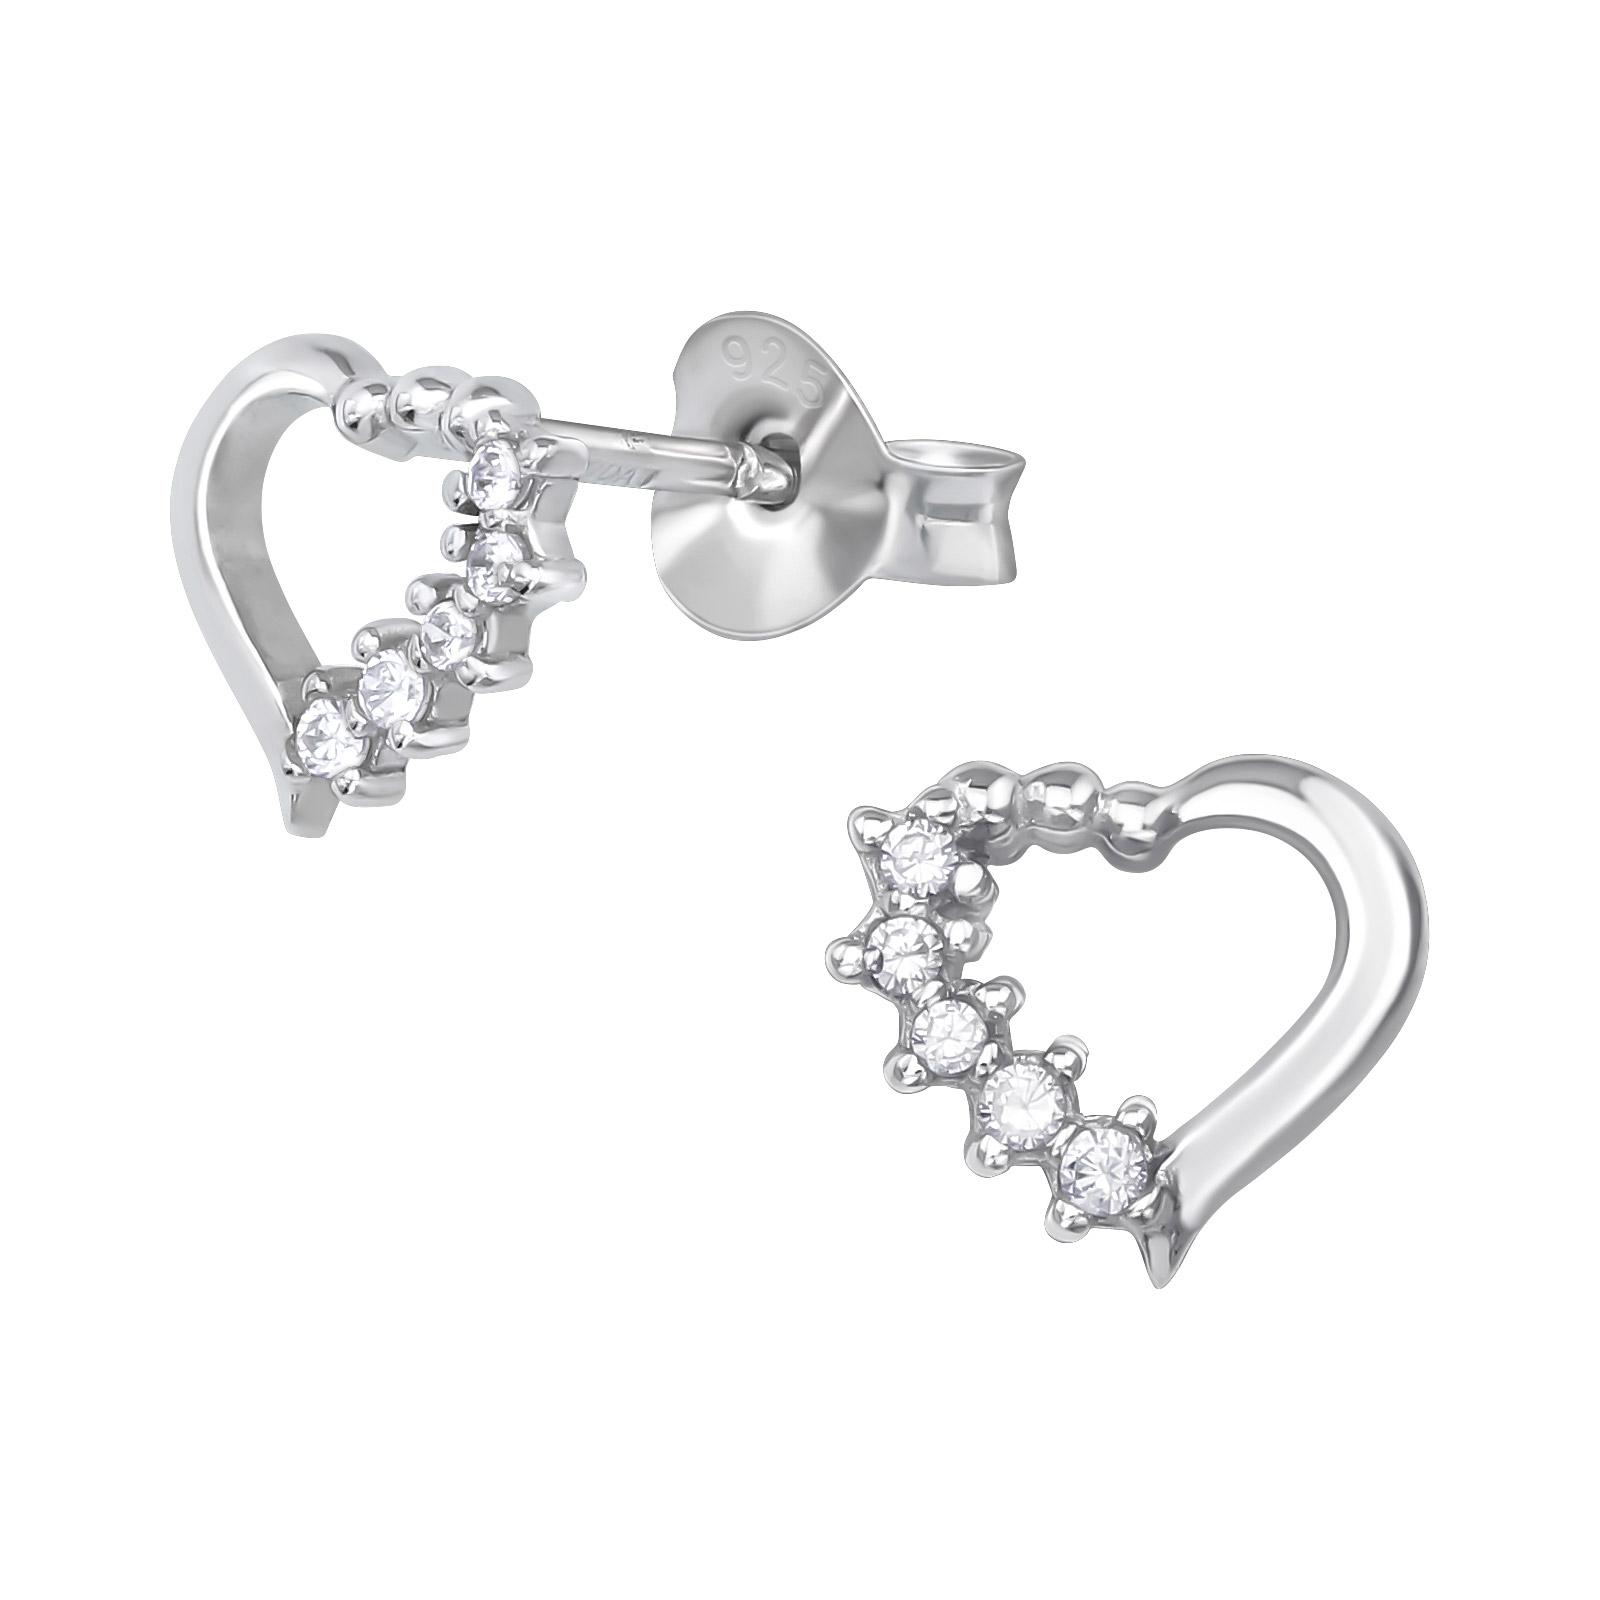 Mens Womens Fashion Pink Heart Lollipop Bow Stainless Steel Stud Earrings New